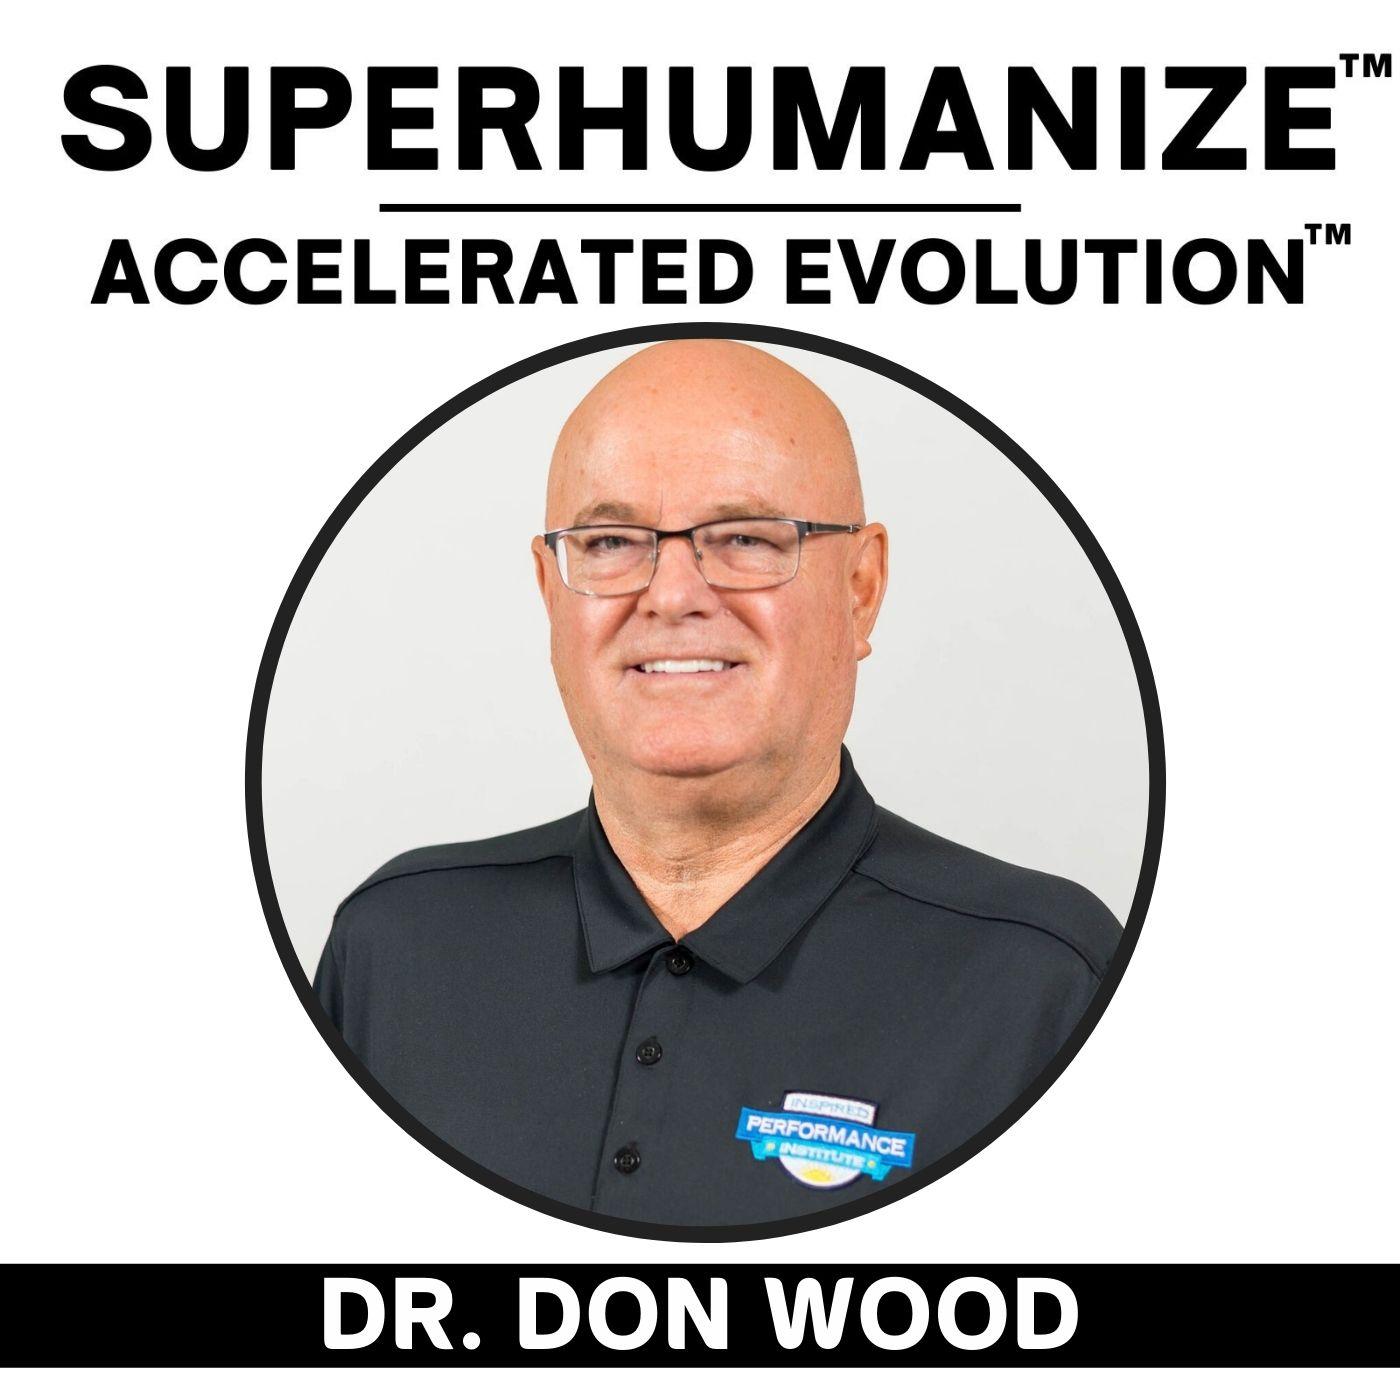 Artwork for podcast The Superhumanize Podcast